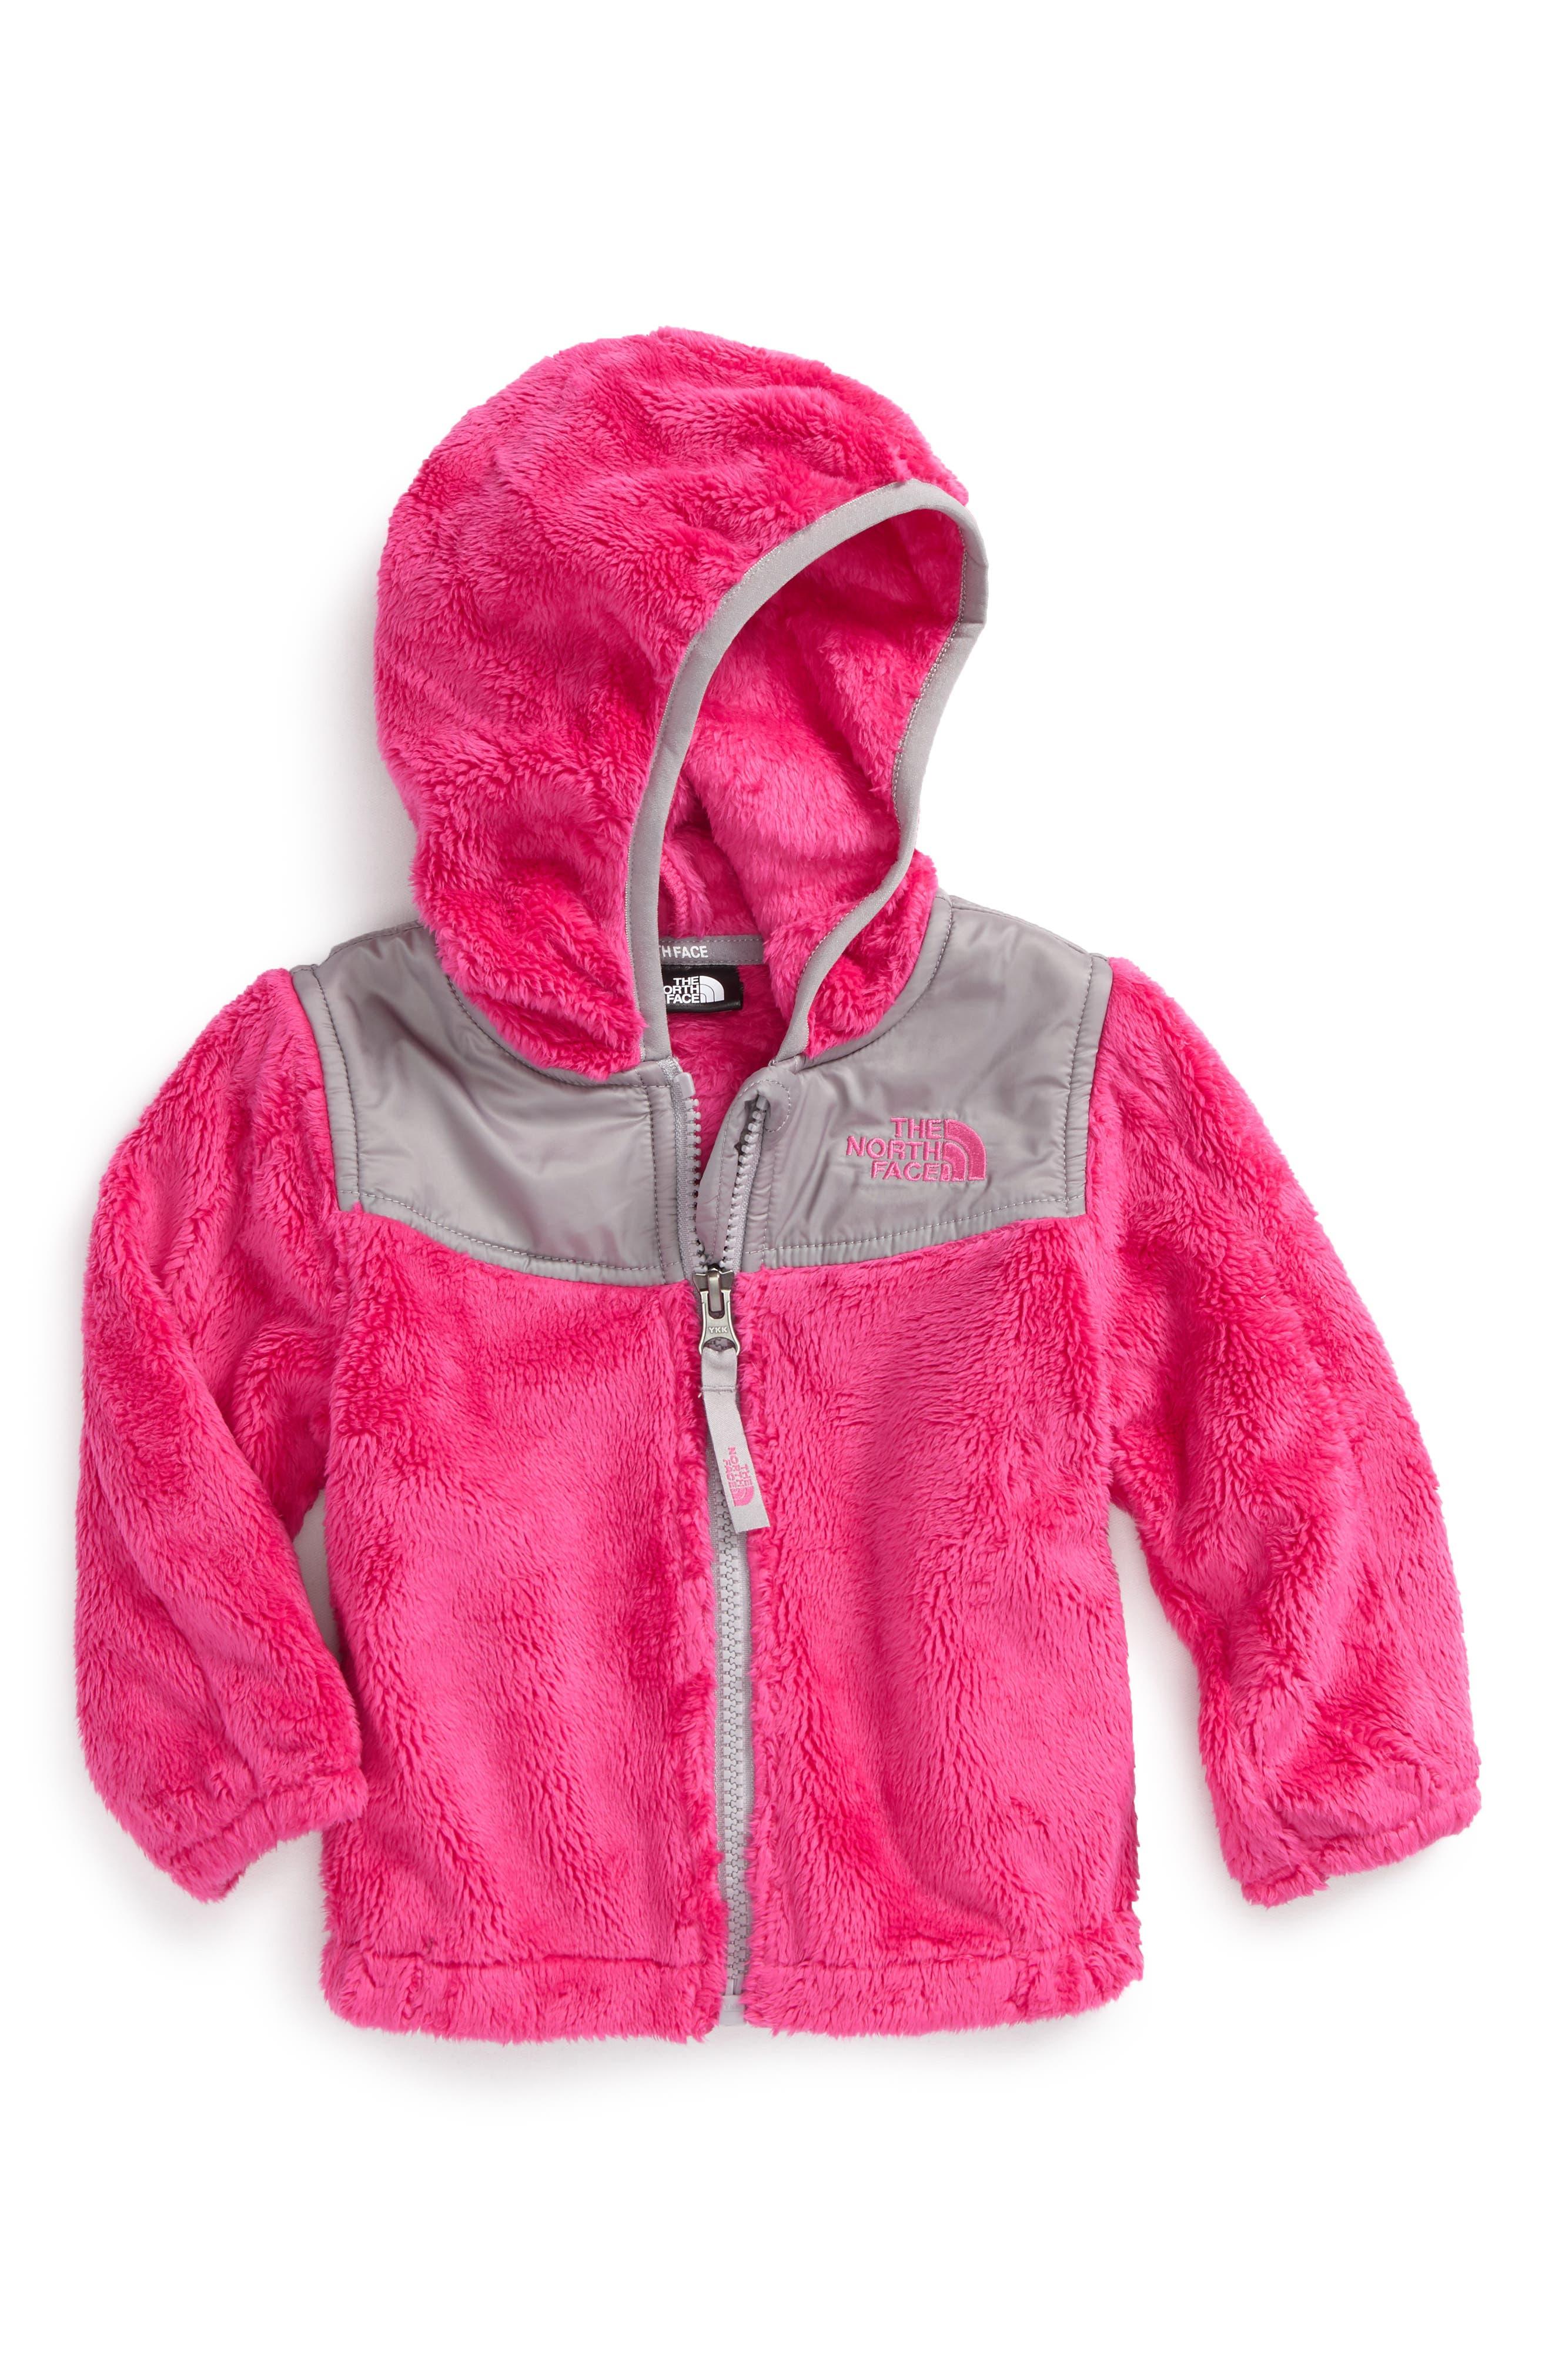 'Oso' Fleece Hooded Jacket,                         Main,                         color, Petticoat Pink